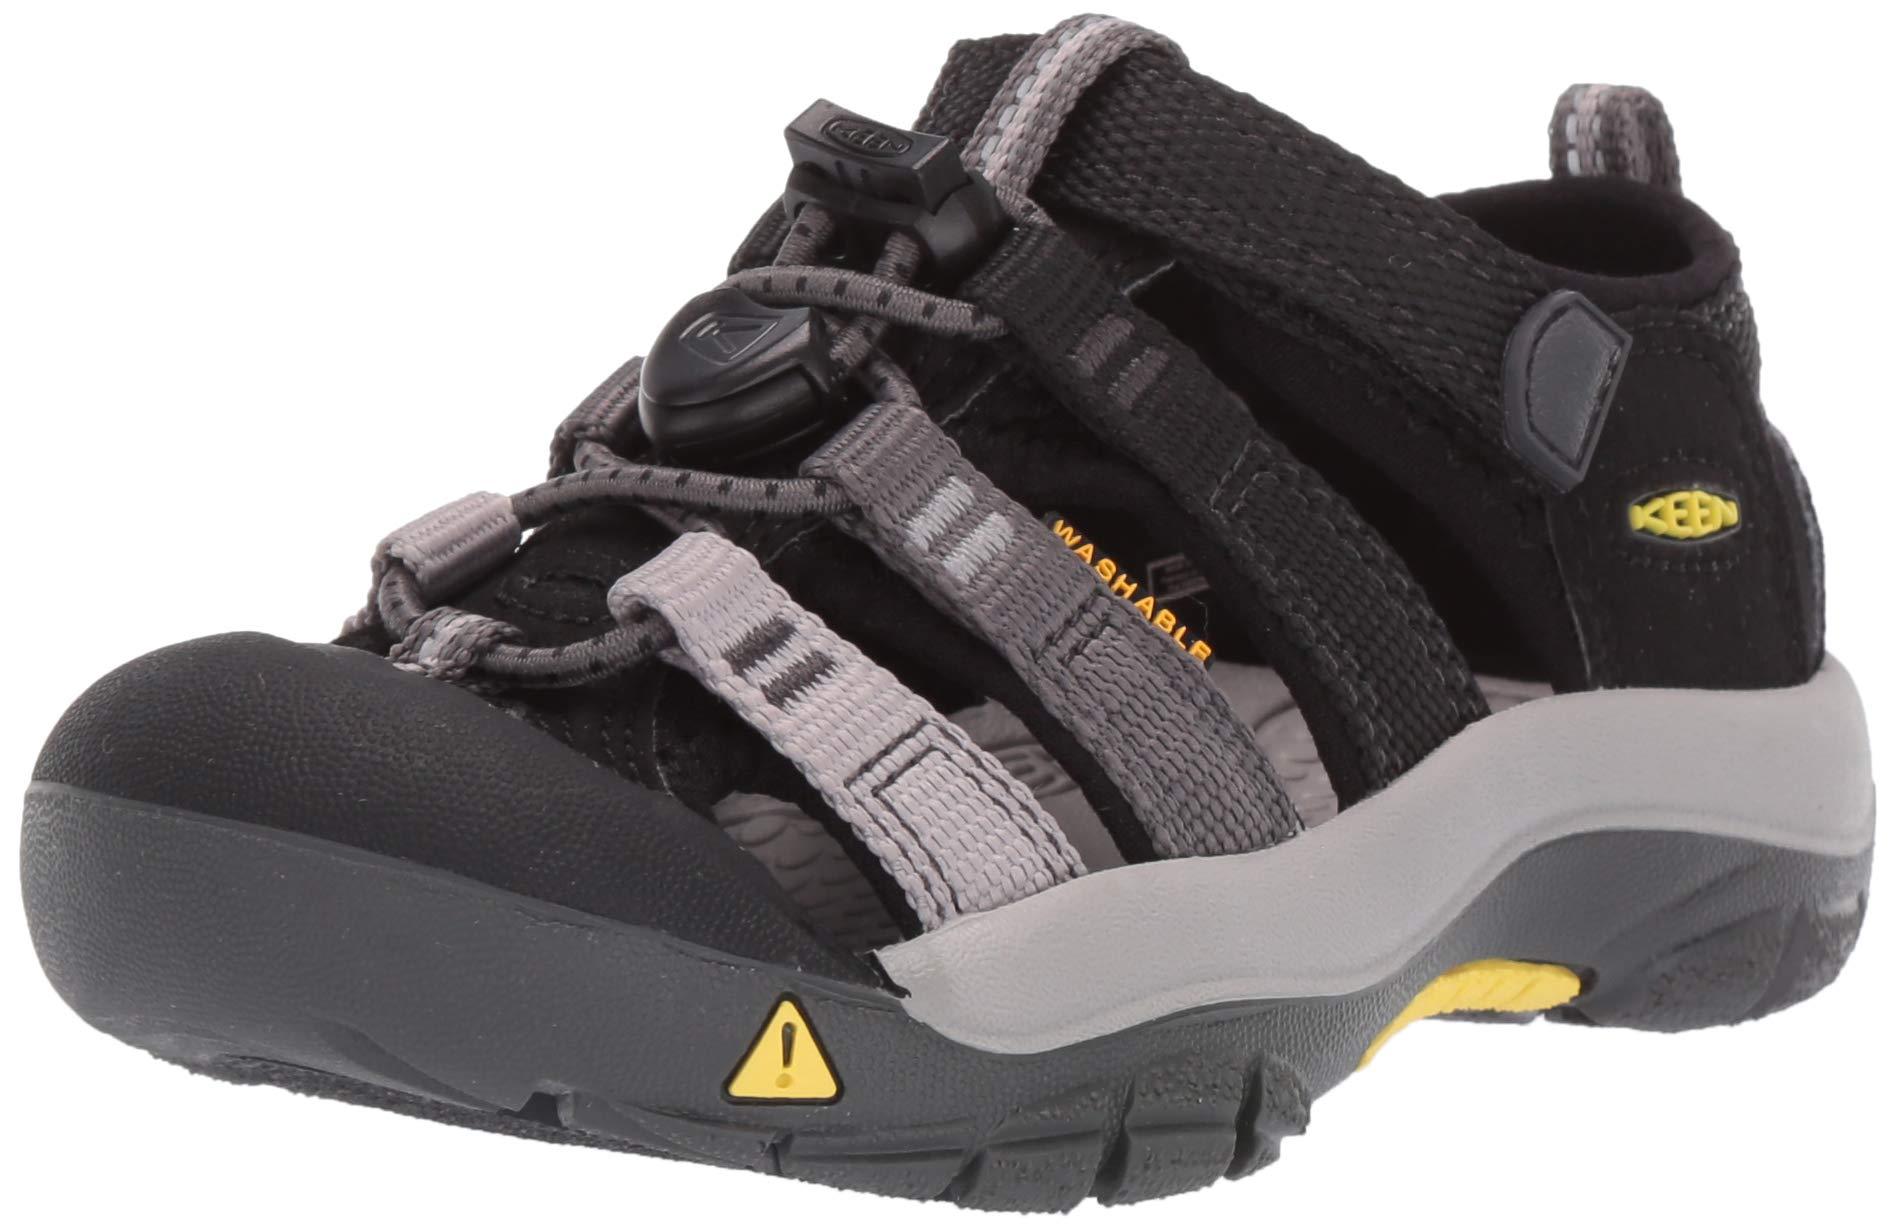 Keen Unisex Newport H2 Water Shoe Black/Magnet 6 M US Big Kid